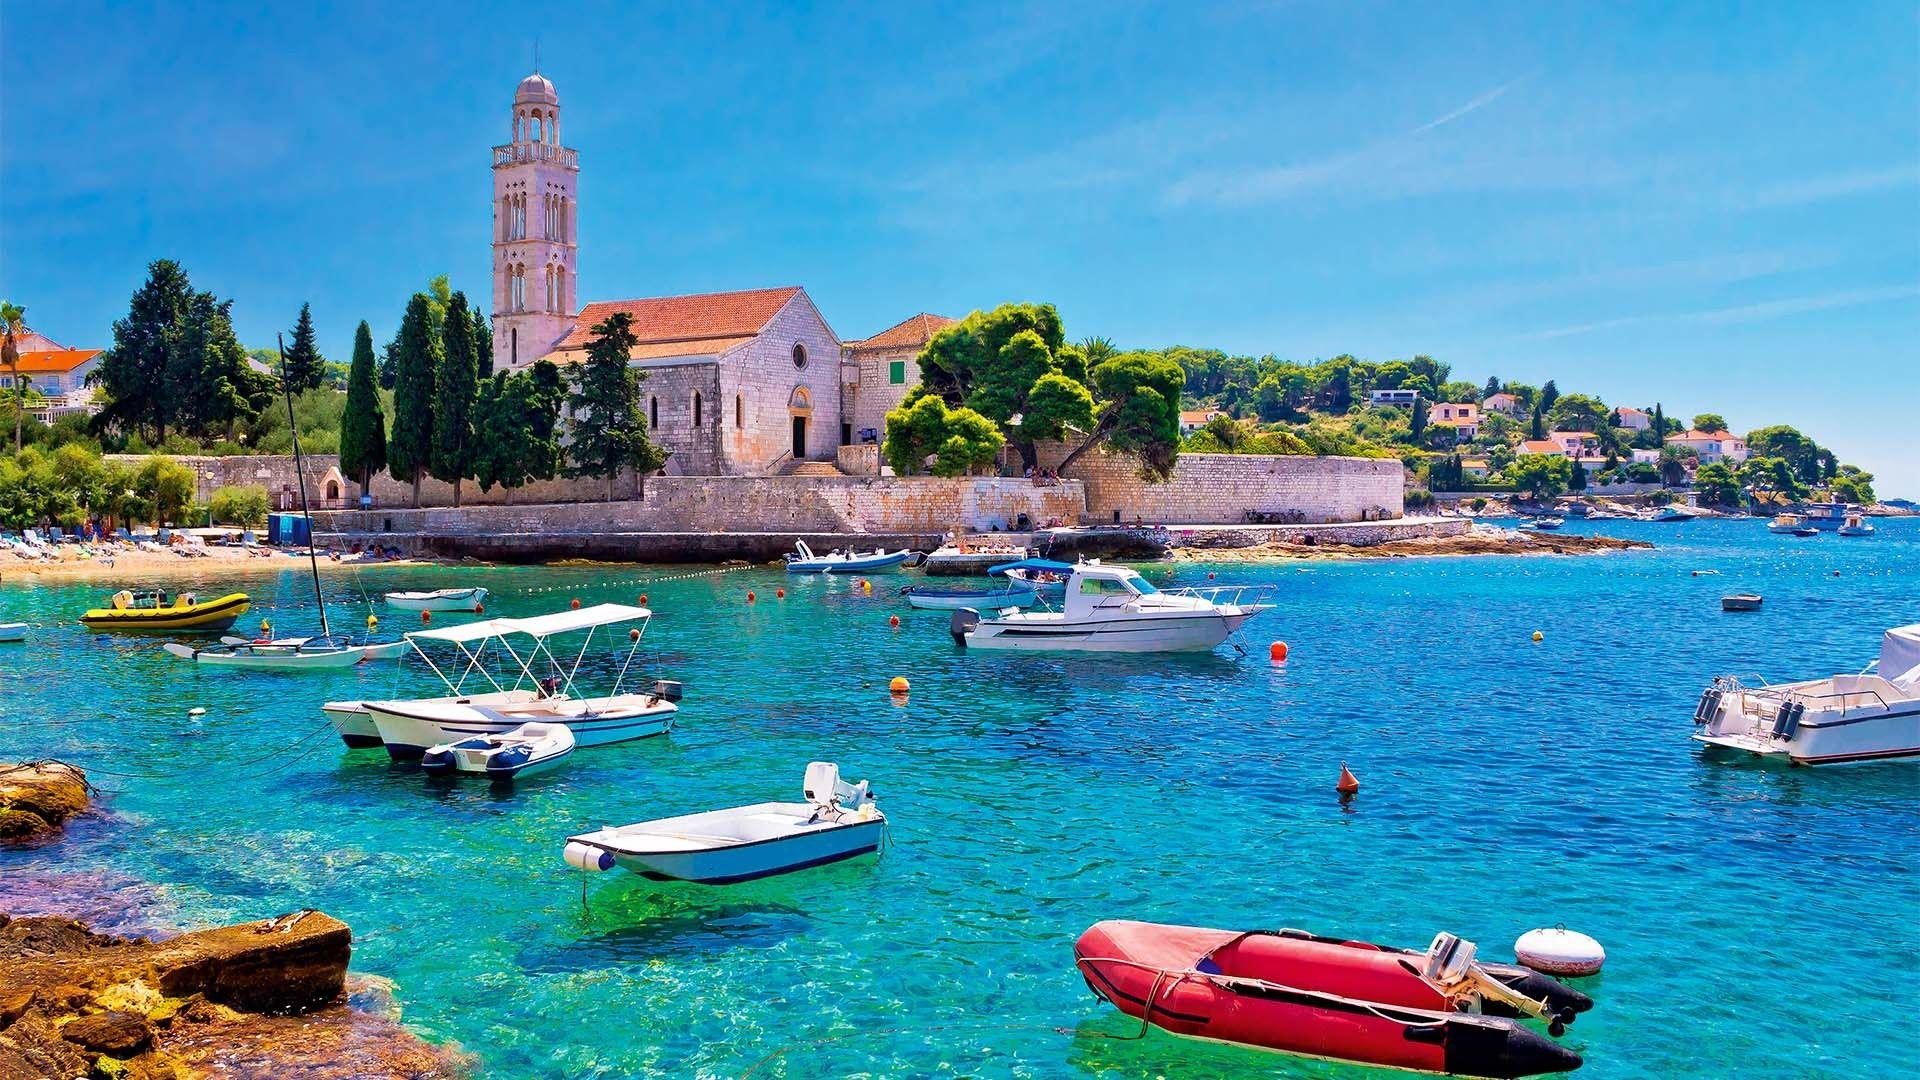 Insula Hvar - Croatia